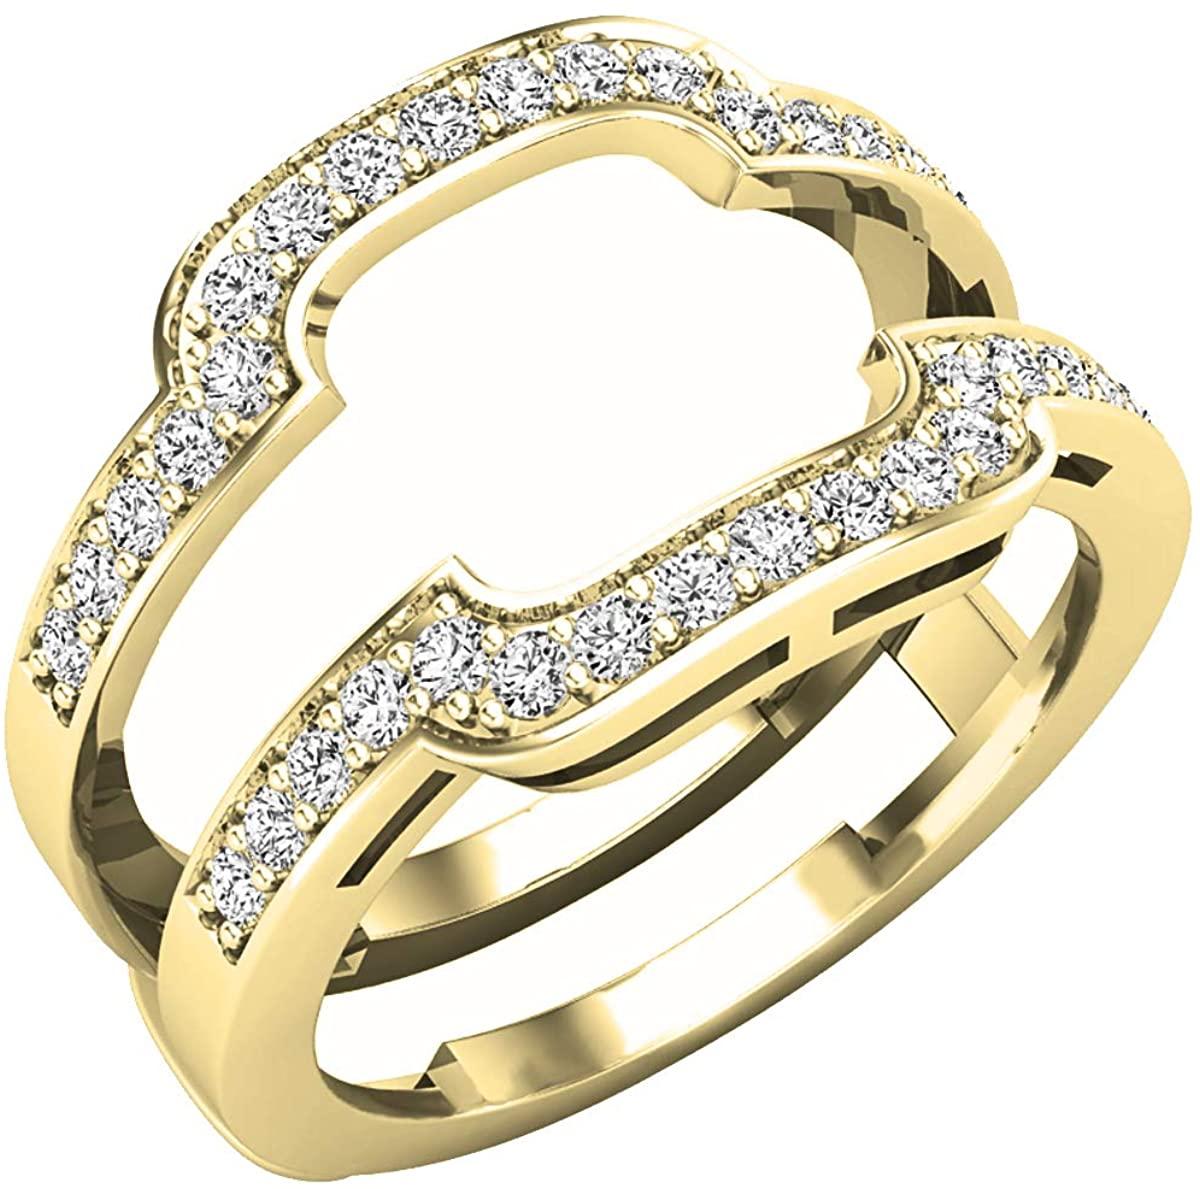 Dazzlingrock Collection 0.45 Carat (ctw) Round Lab Grown Diamond Ladies Guard Double Wedding Band 1/2 CT, 10K Gold